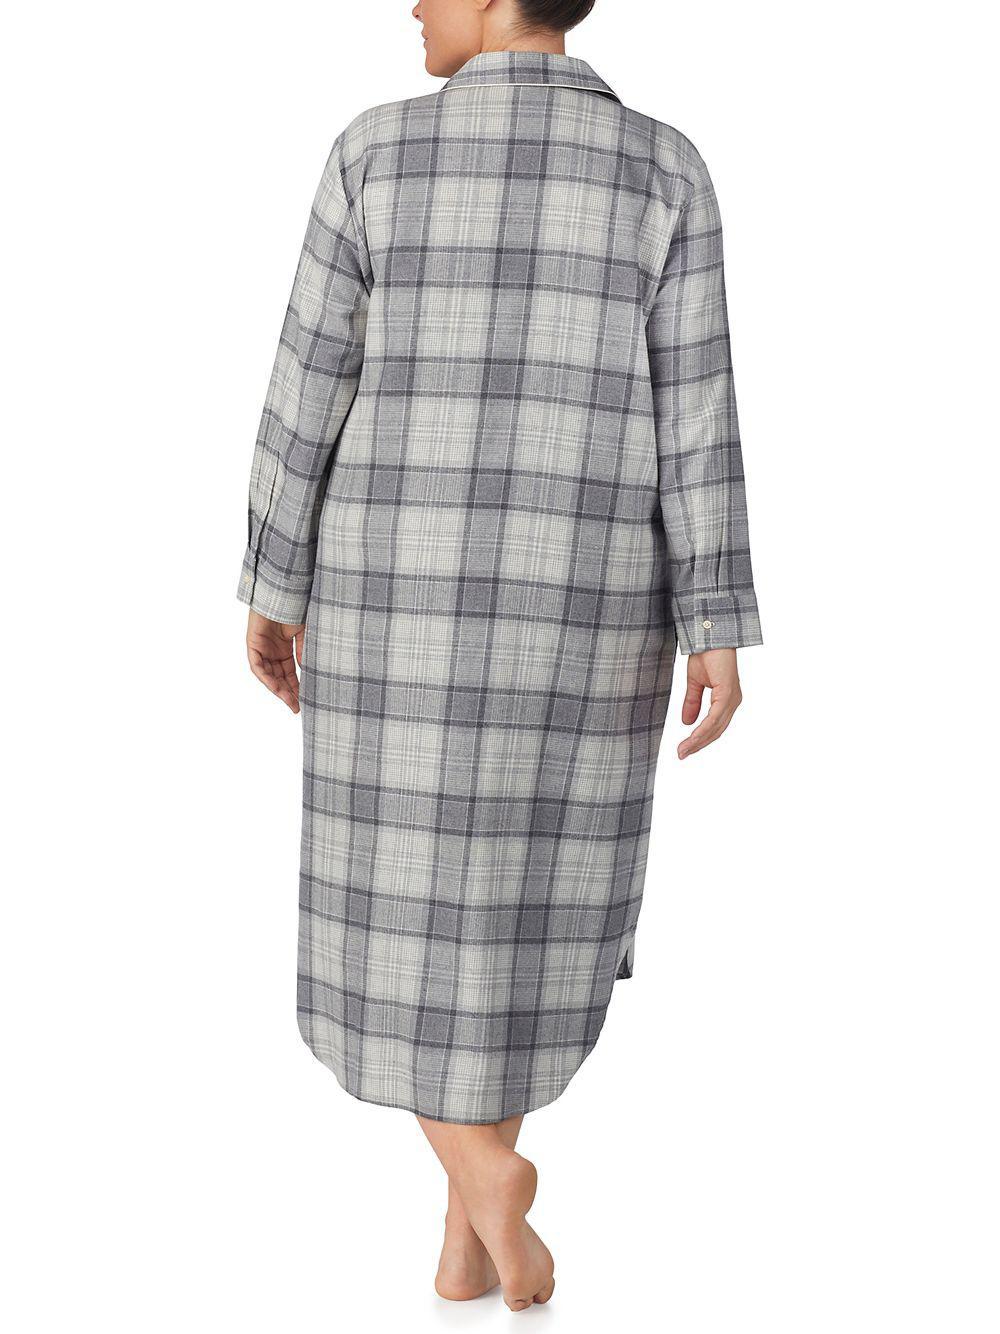 Lyst - Lauren By Ralph Lauren Plus Plaid Long Sleepshirt in Gray 09cc89e4c